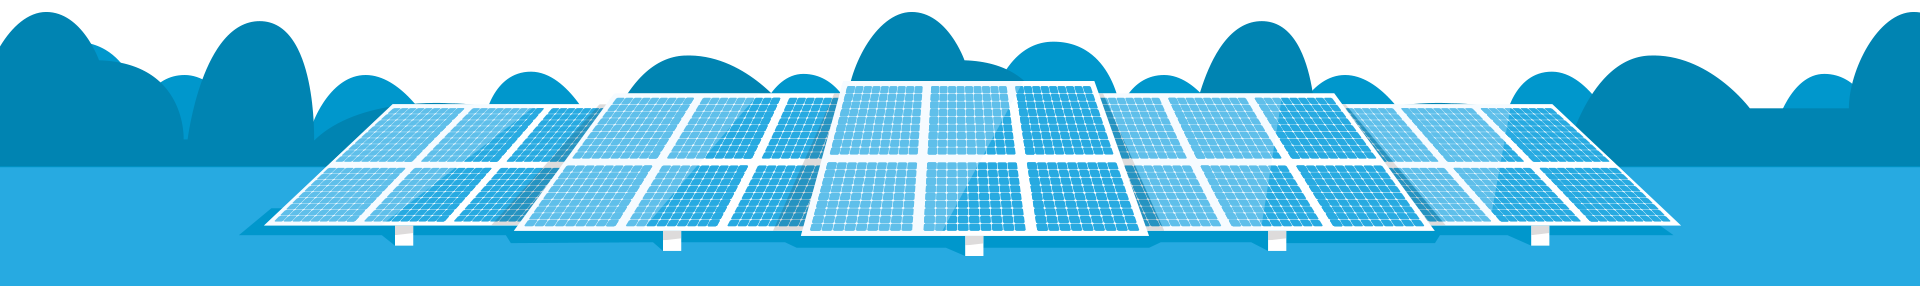 Illustration: Solar power array